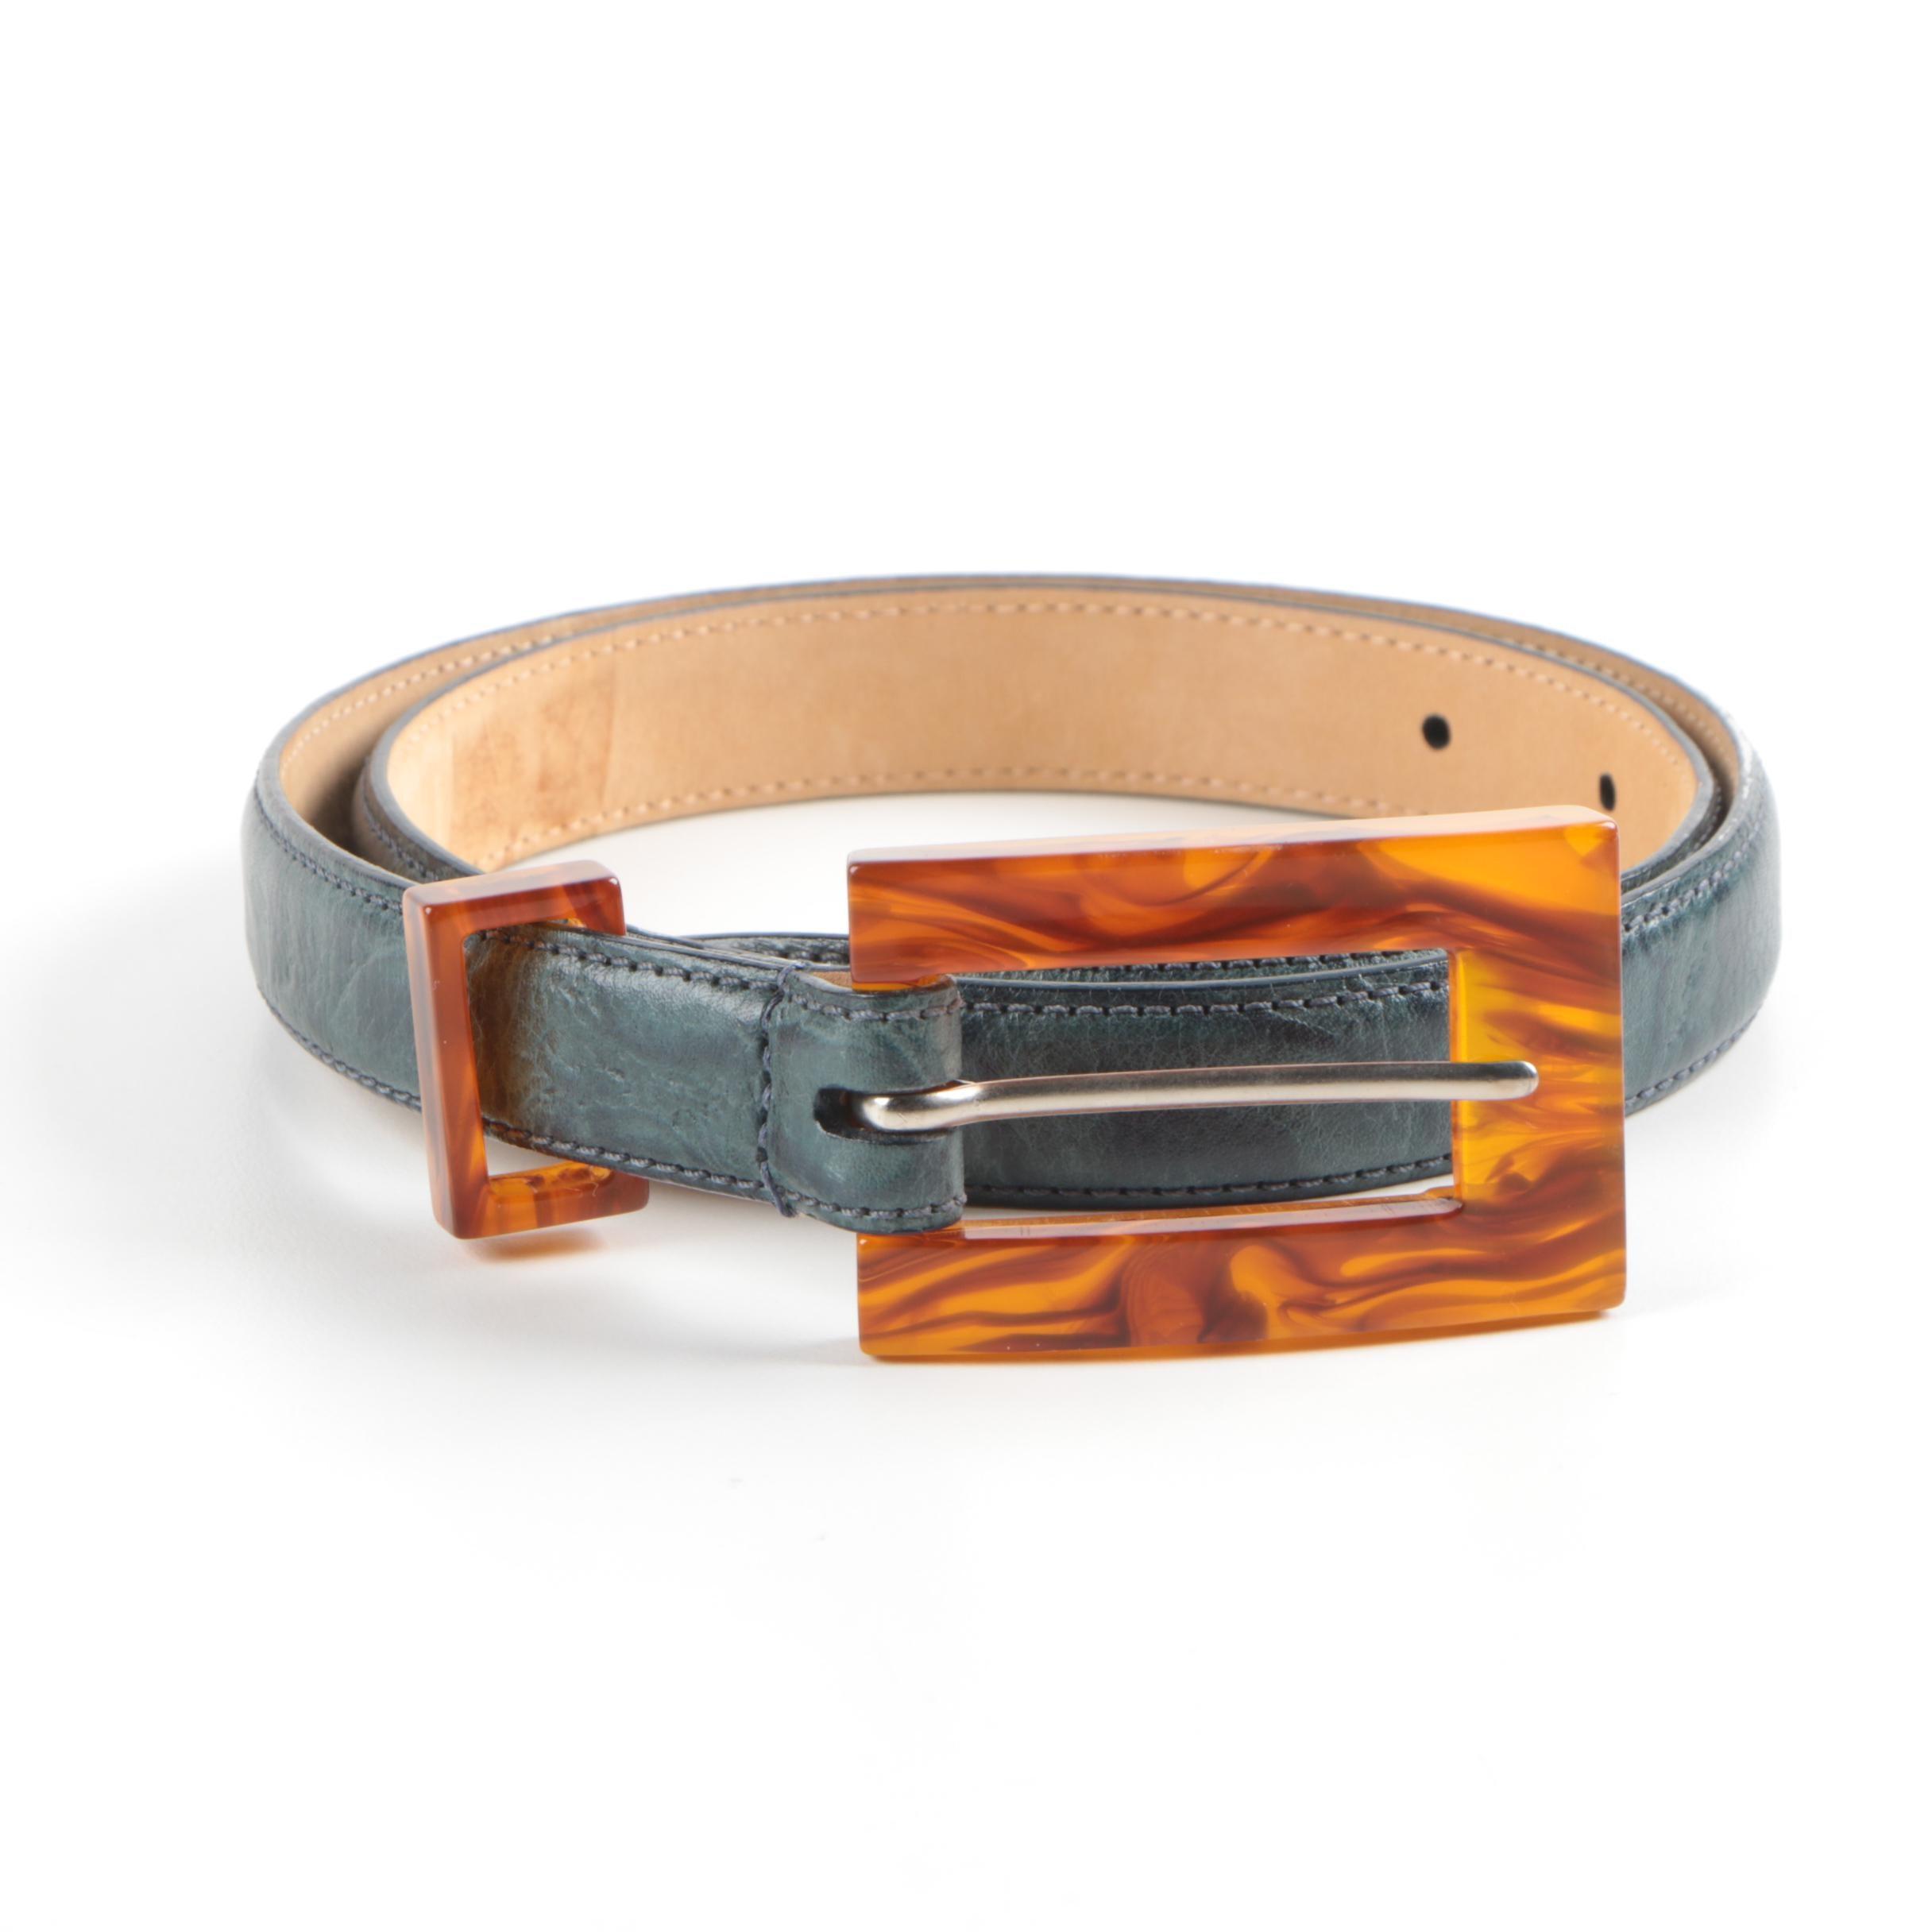 Worth Calfskin Leather Belt